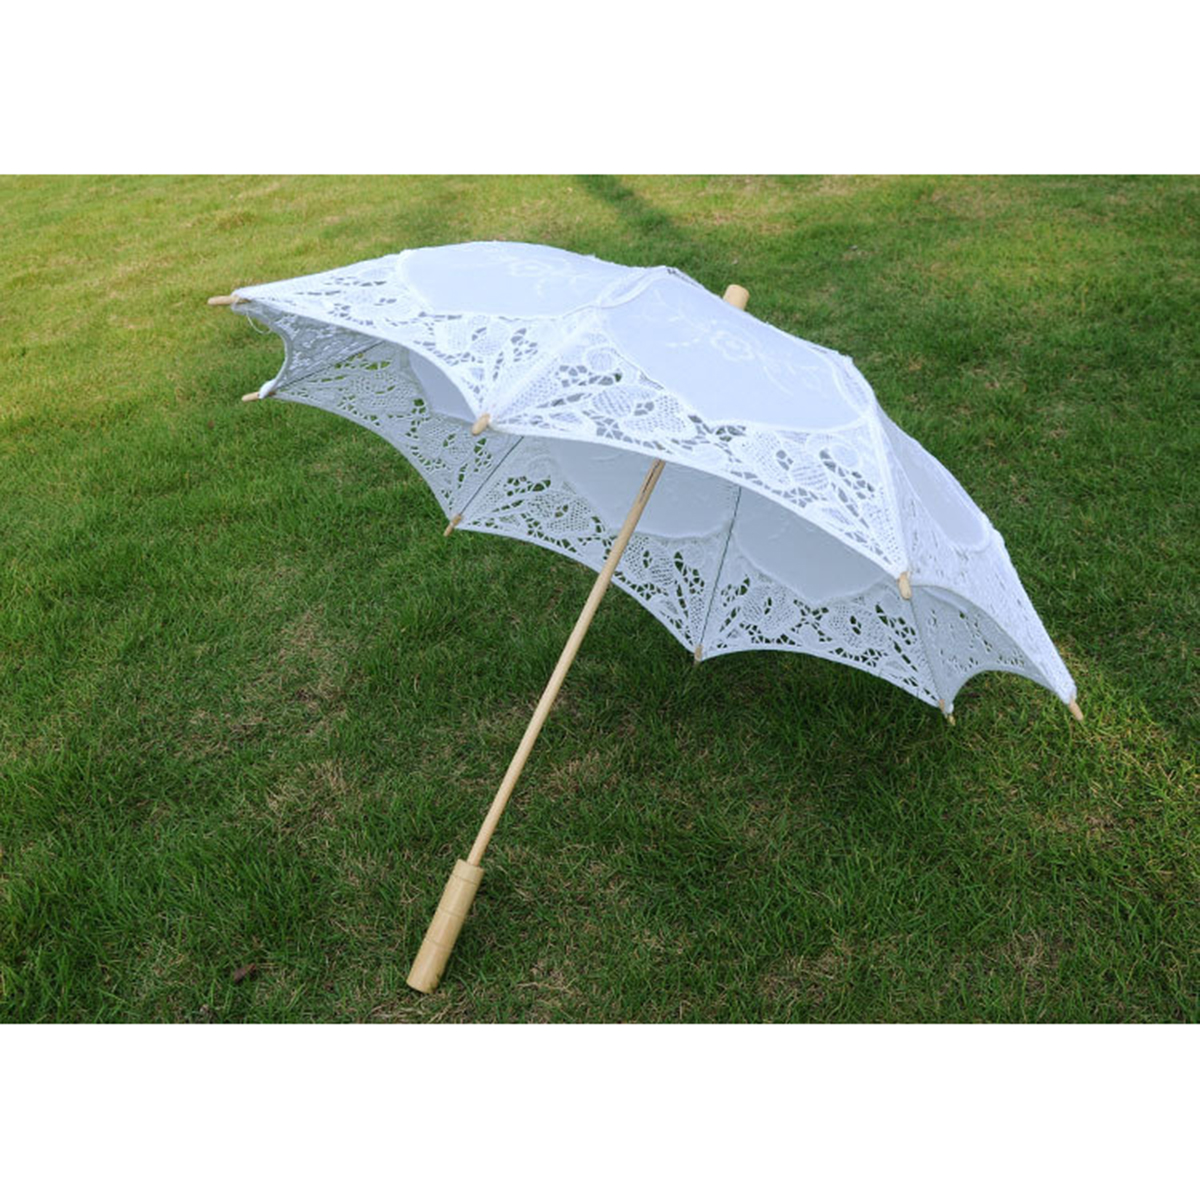 Bridal Wedding Umbrella Lace Cotton Embroidery Handmade Parasol Umbrella Parapluie Mariage S Size 38cm